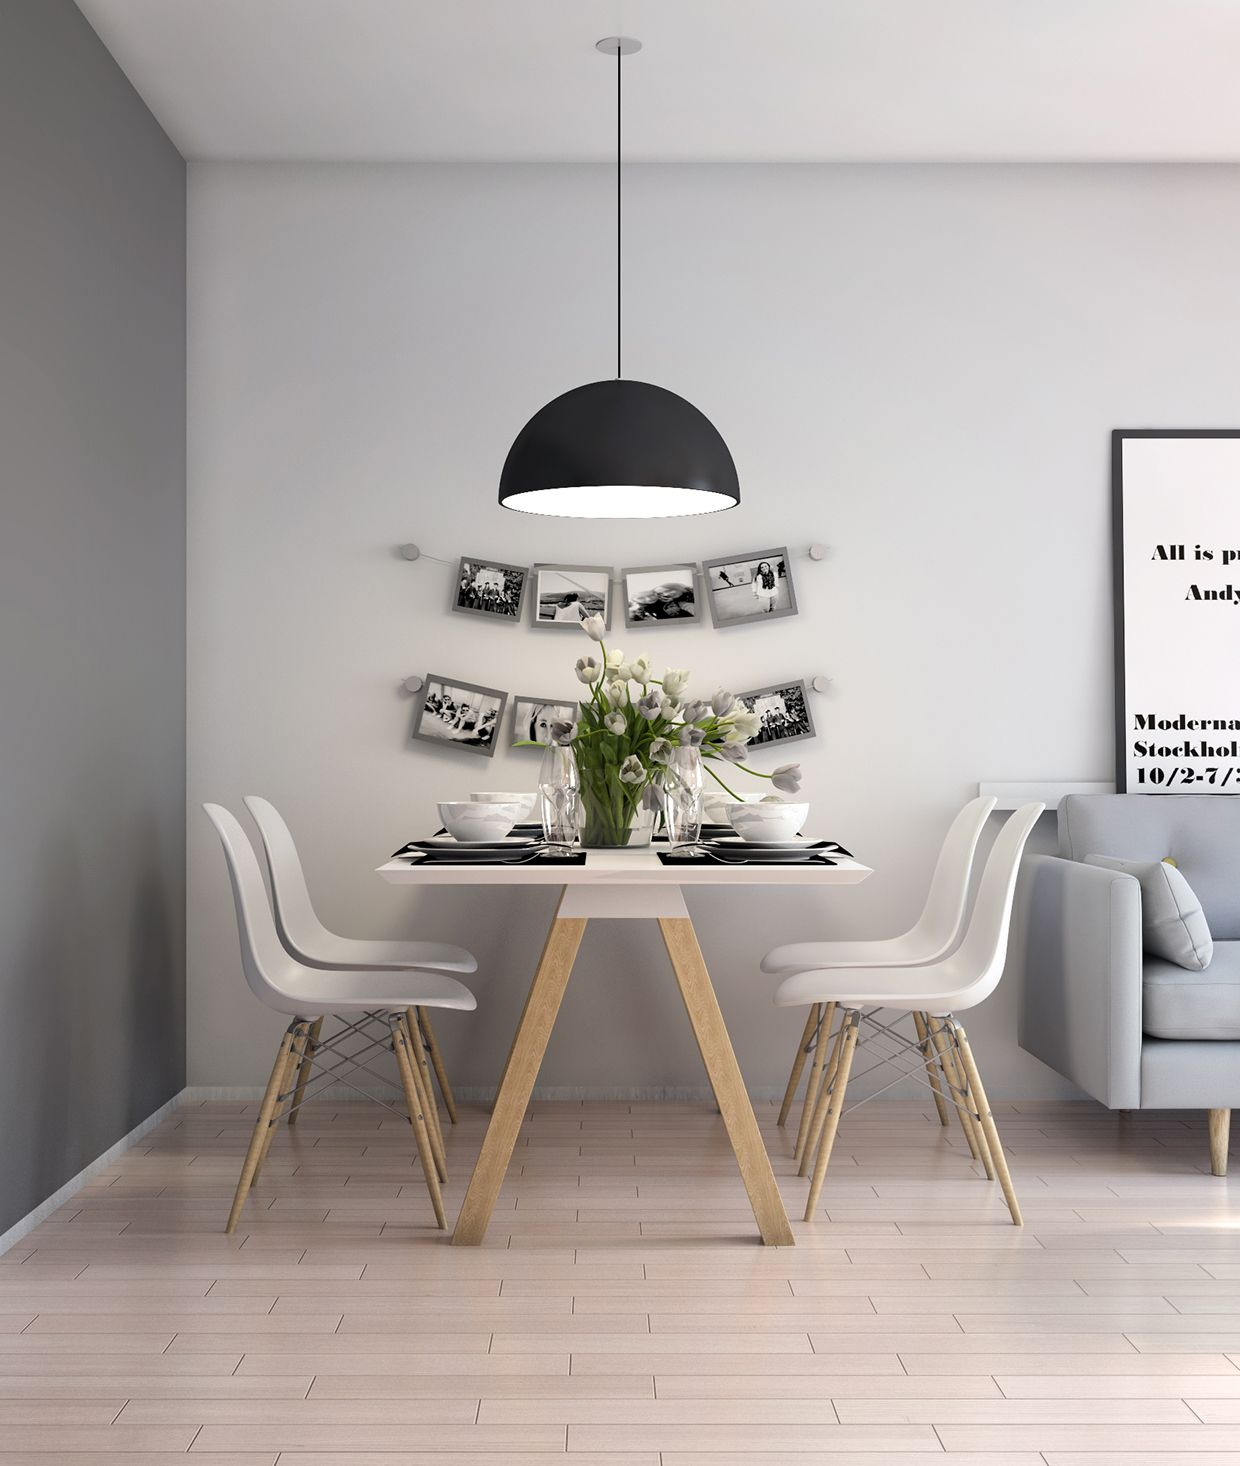 Pin On Deco Salon #scandinavian #interior #design #living #room